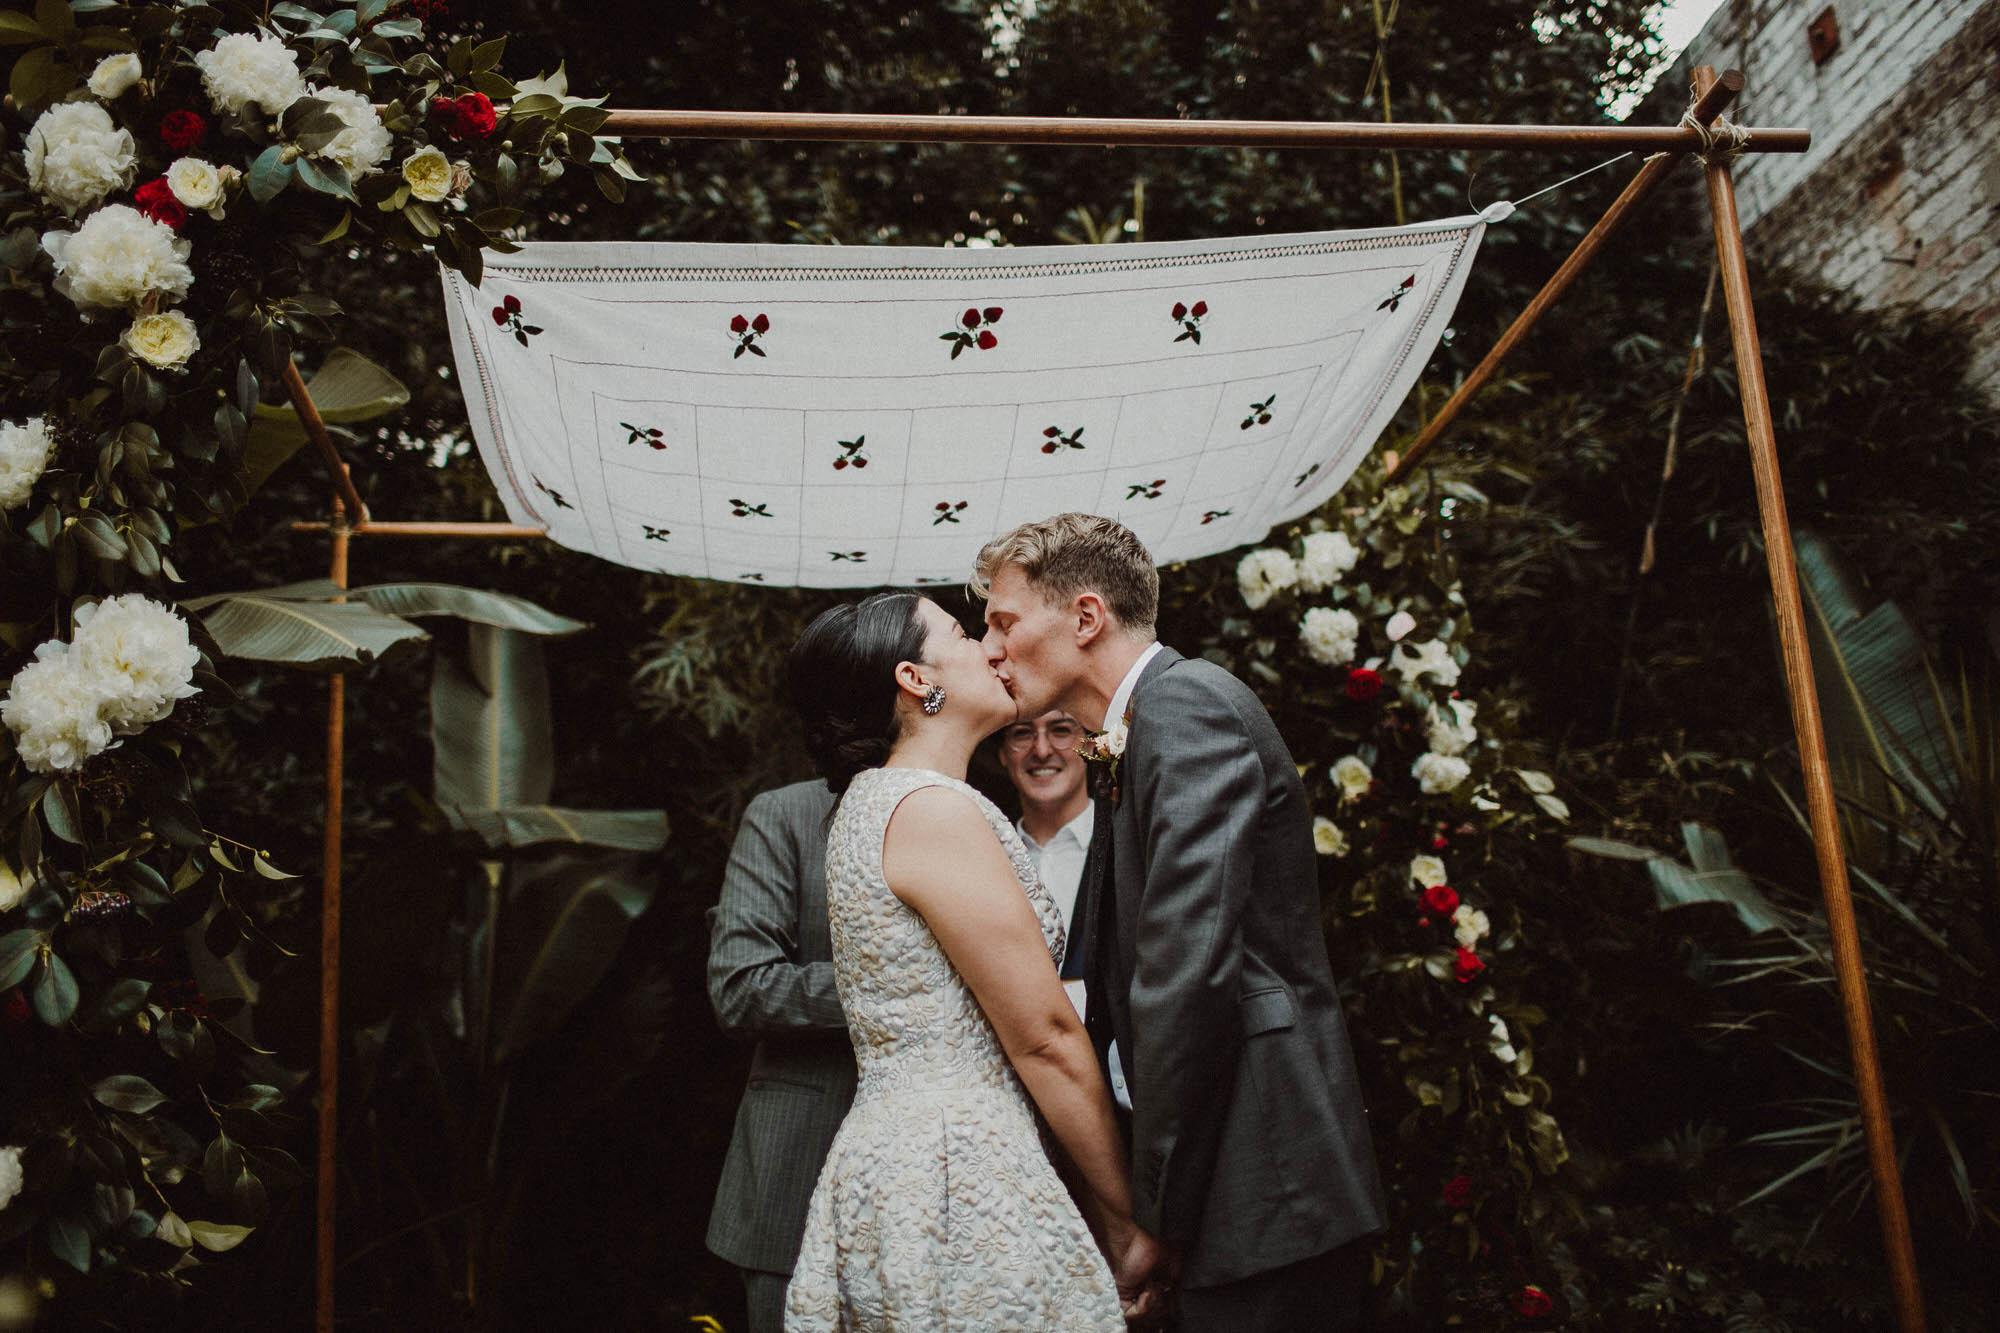 los-angeles-wedding-photographer-millwick-112.jpg